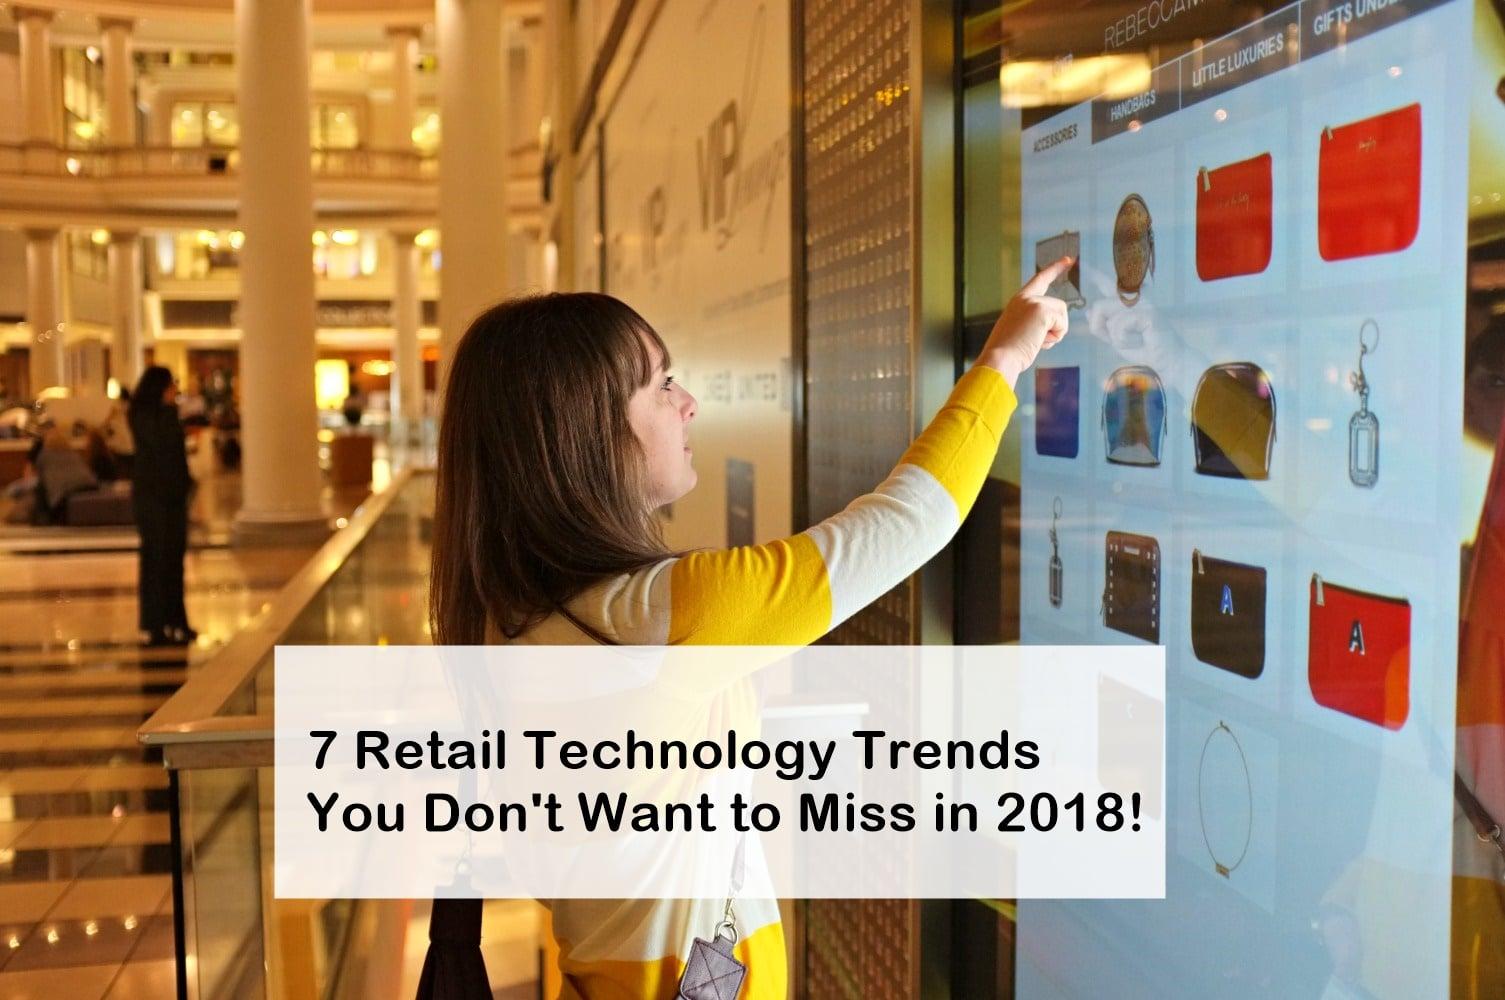 7 Teknologi Ritel Populer di Tahun 2018 yang Patut Dipertimbangkan